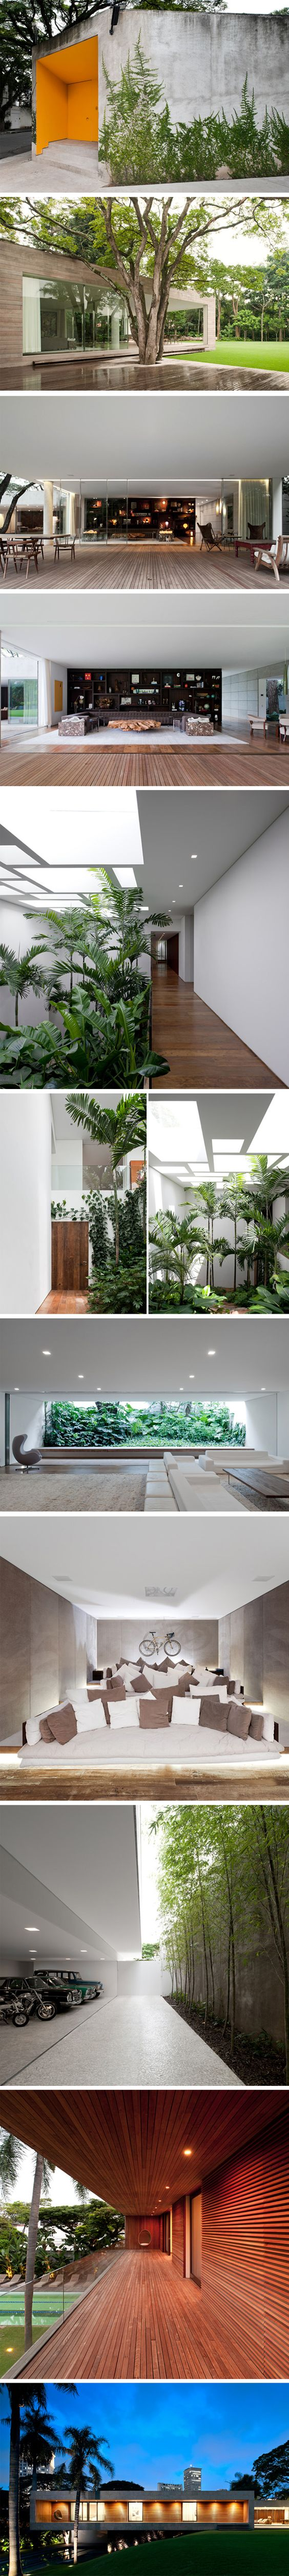 Casa-Grécia-Sao-Paulo-Isay-Weinfeld-2  #Modern #Bauhaus like